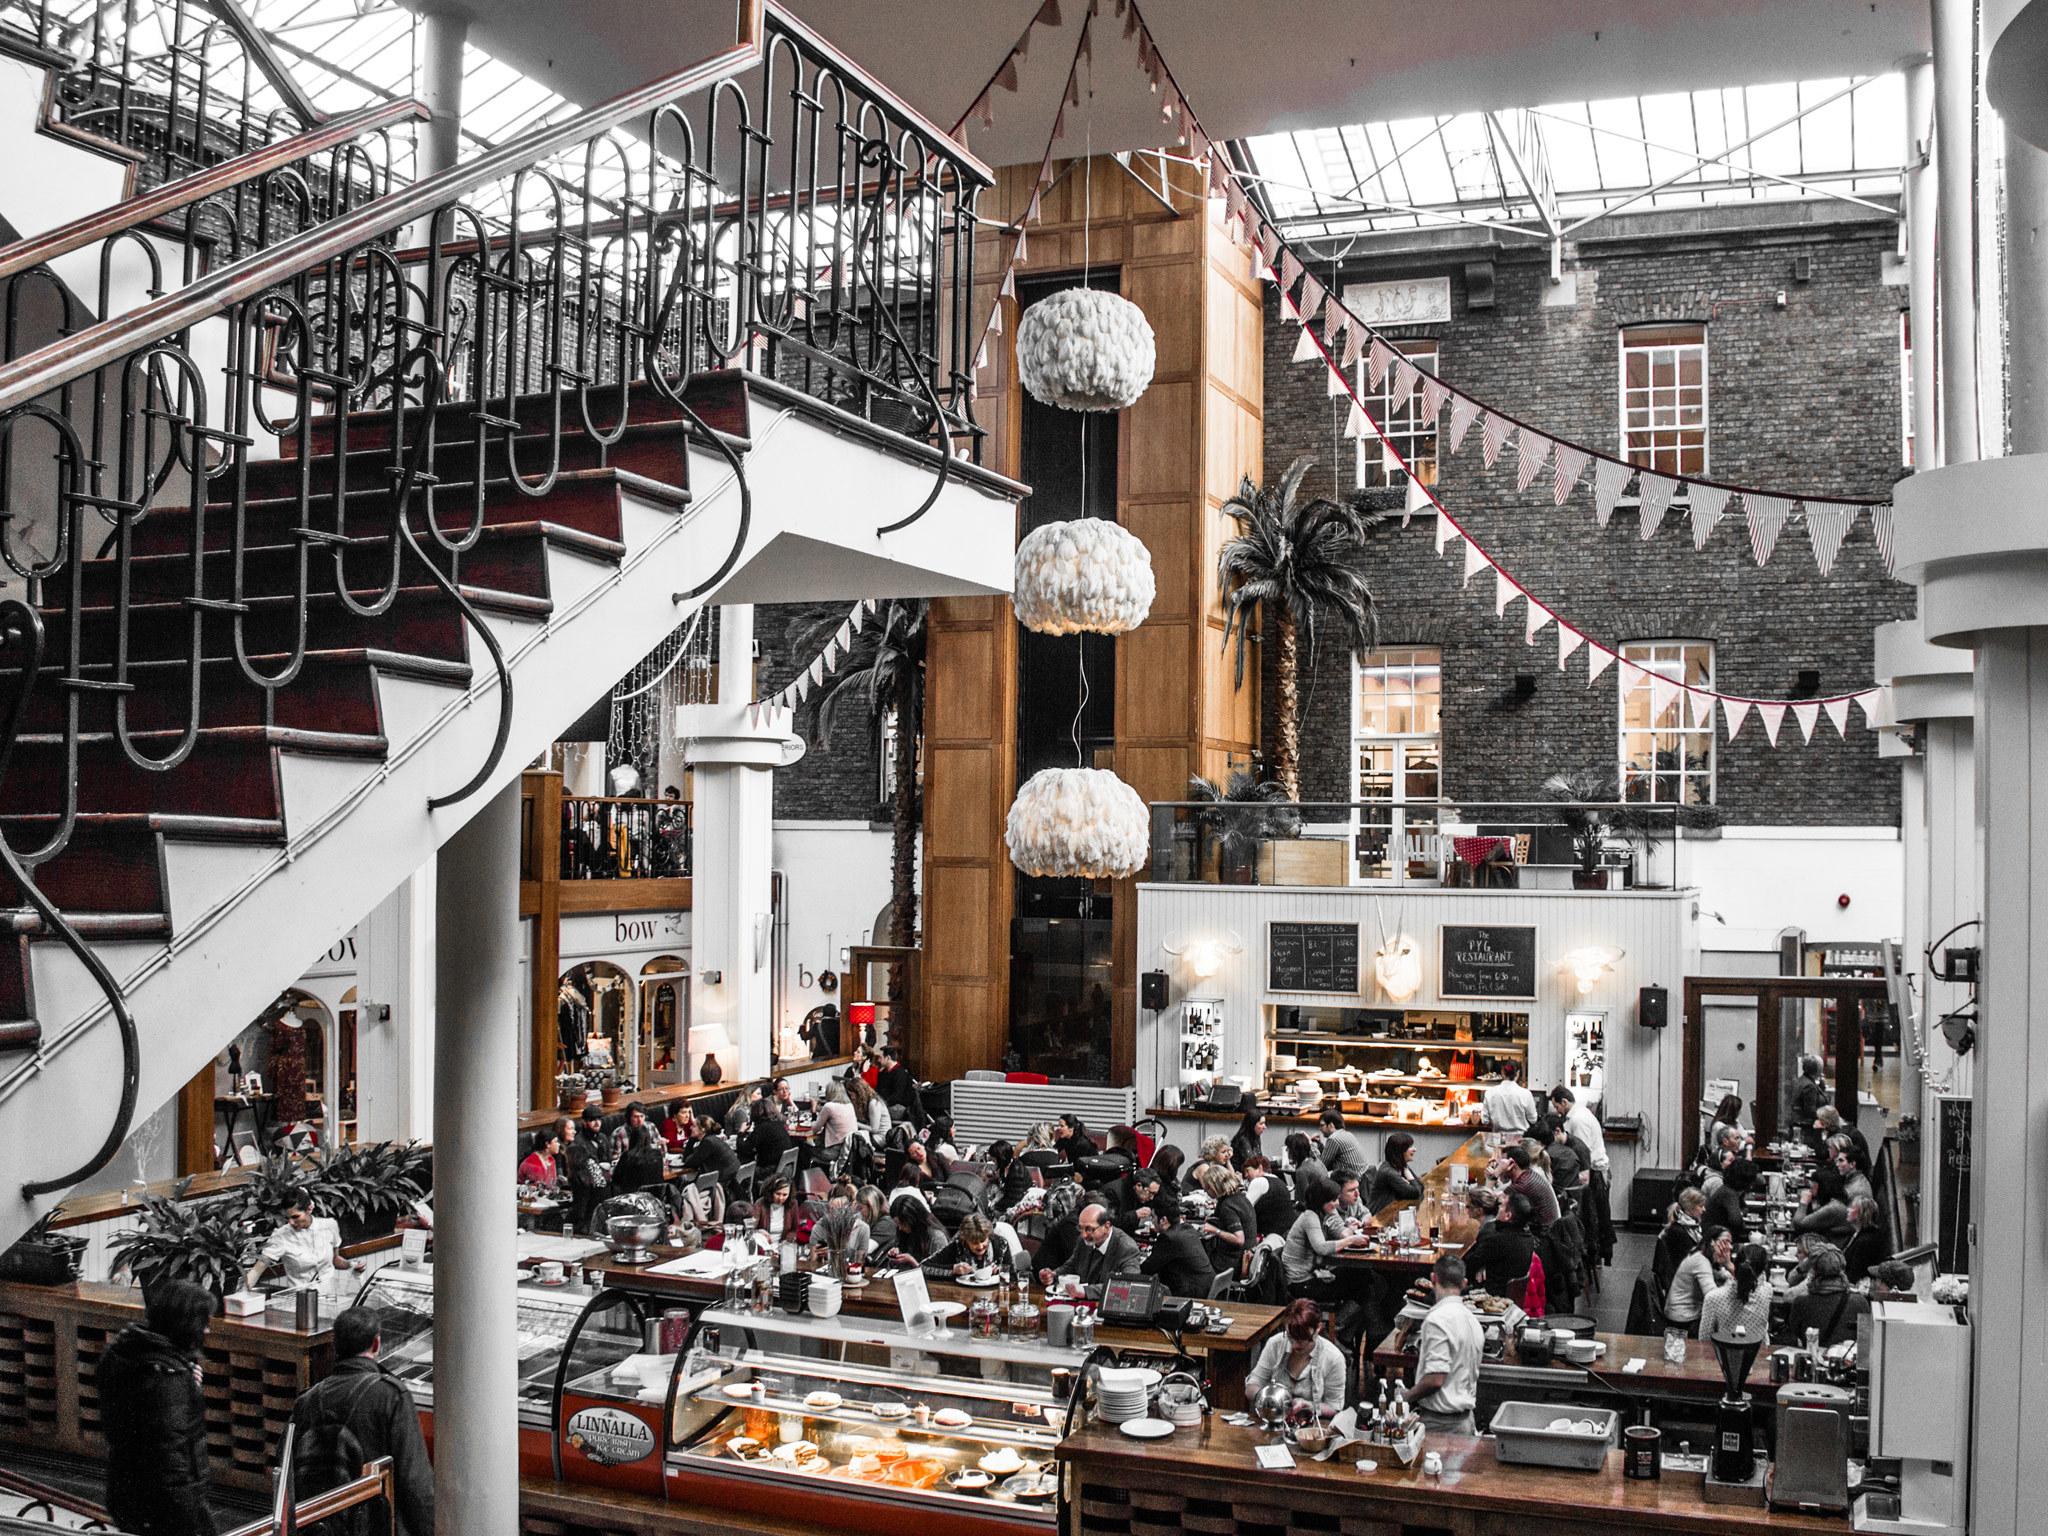 The interior of Powerscourt shopping centre in Dublin